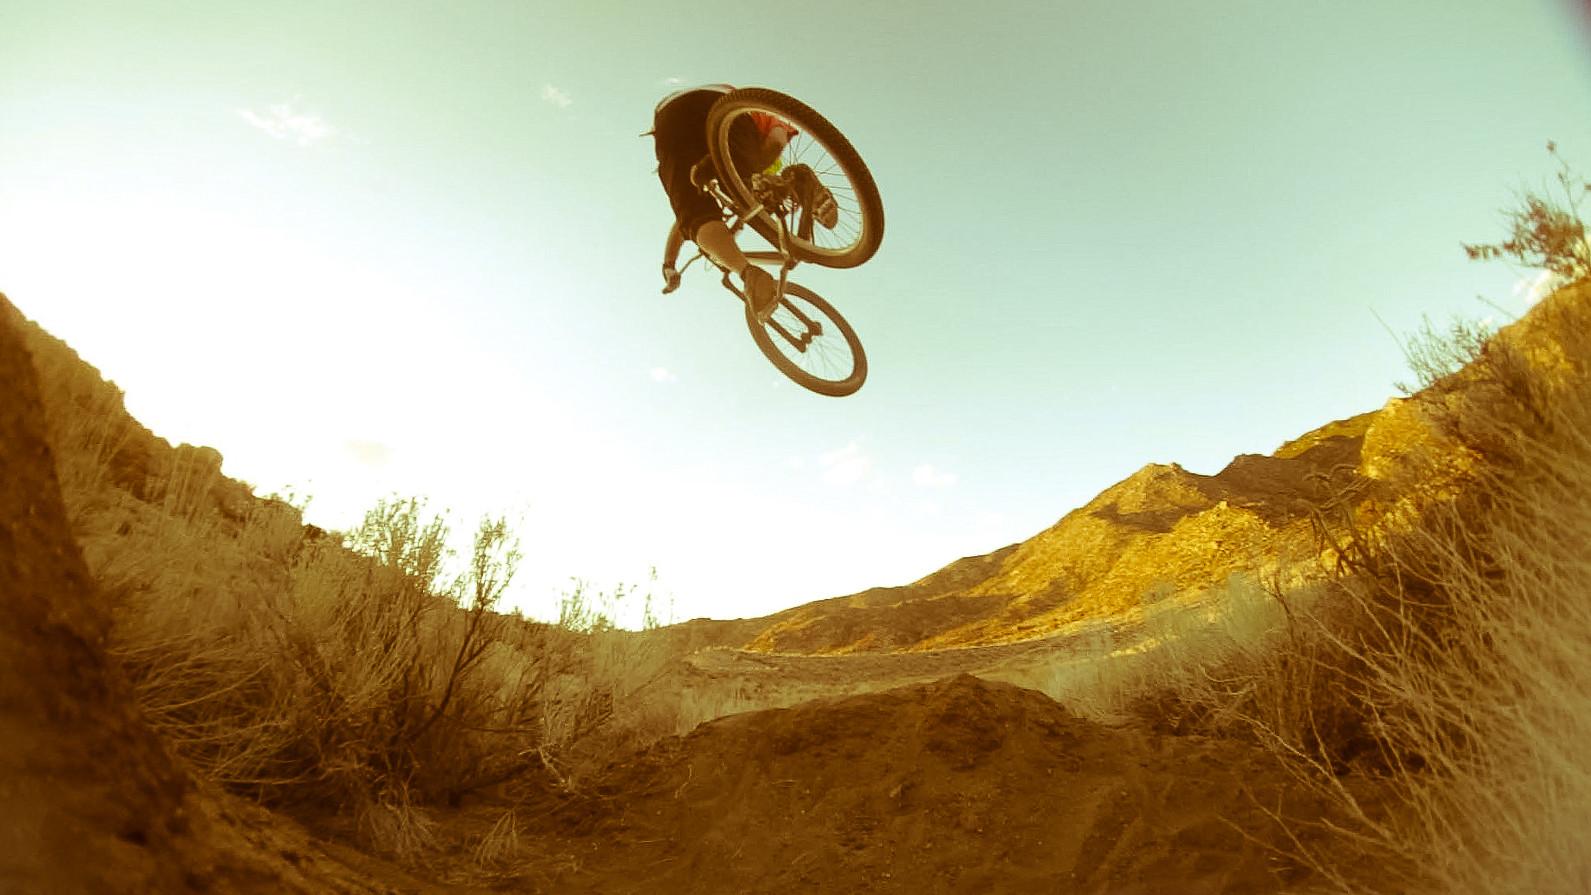 Foothills after work two - jerryhazard - Mountain Biking Pictures - Vital MTB